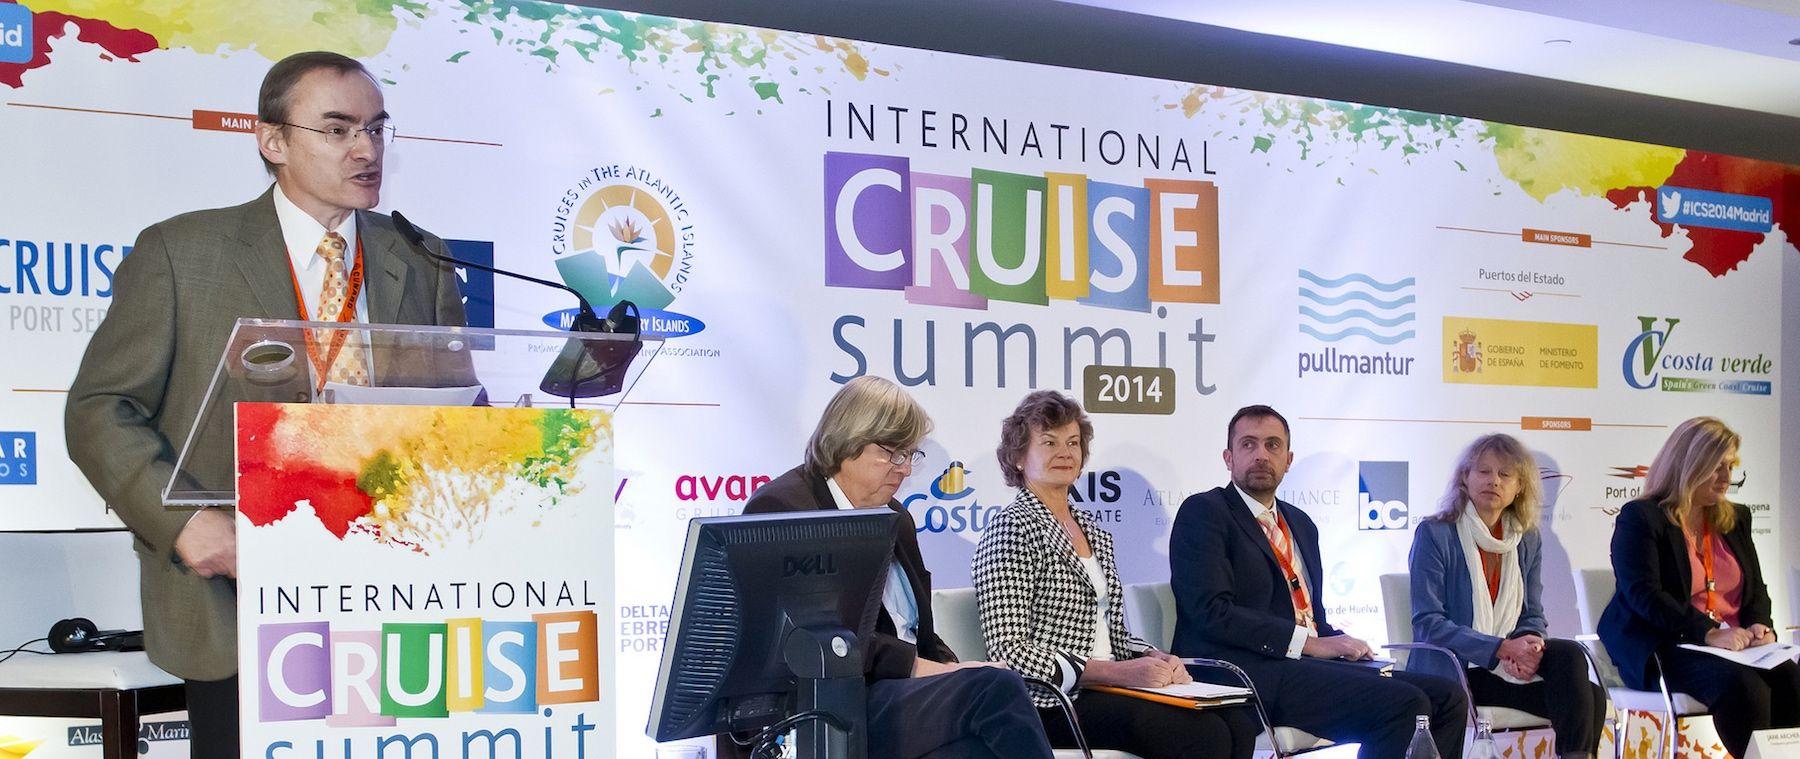 International Cruise Summit - Madrid